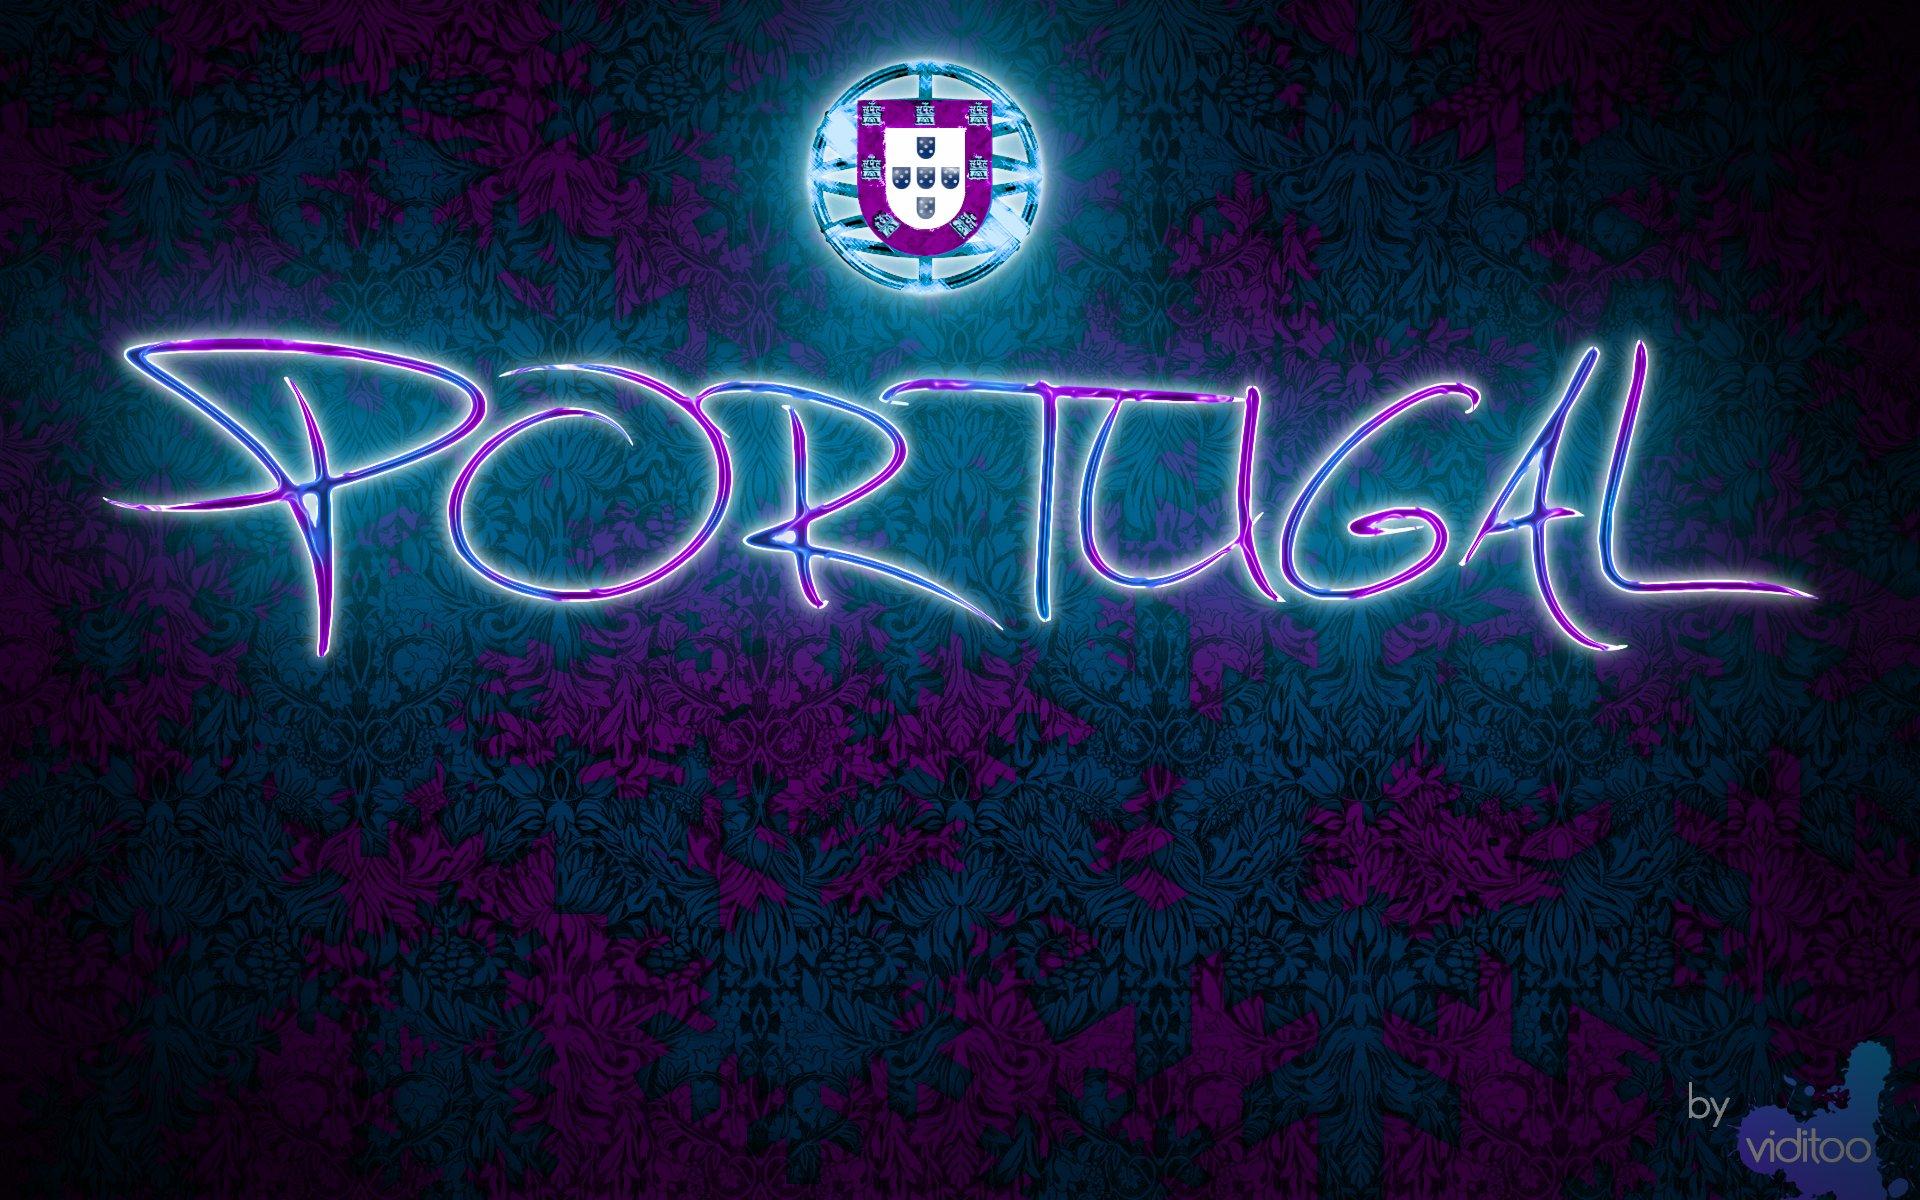 Desktop background fond d 39 cran anim gratuit hello kitty for Fond ecran portugal